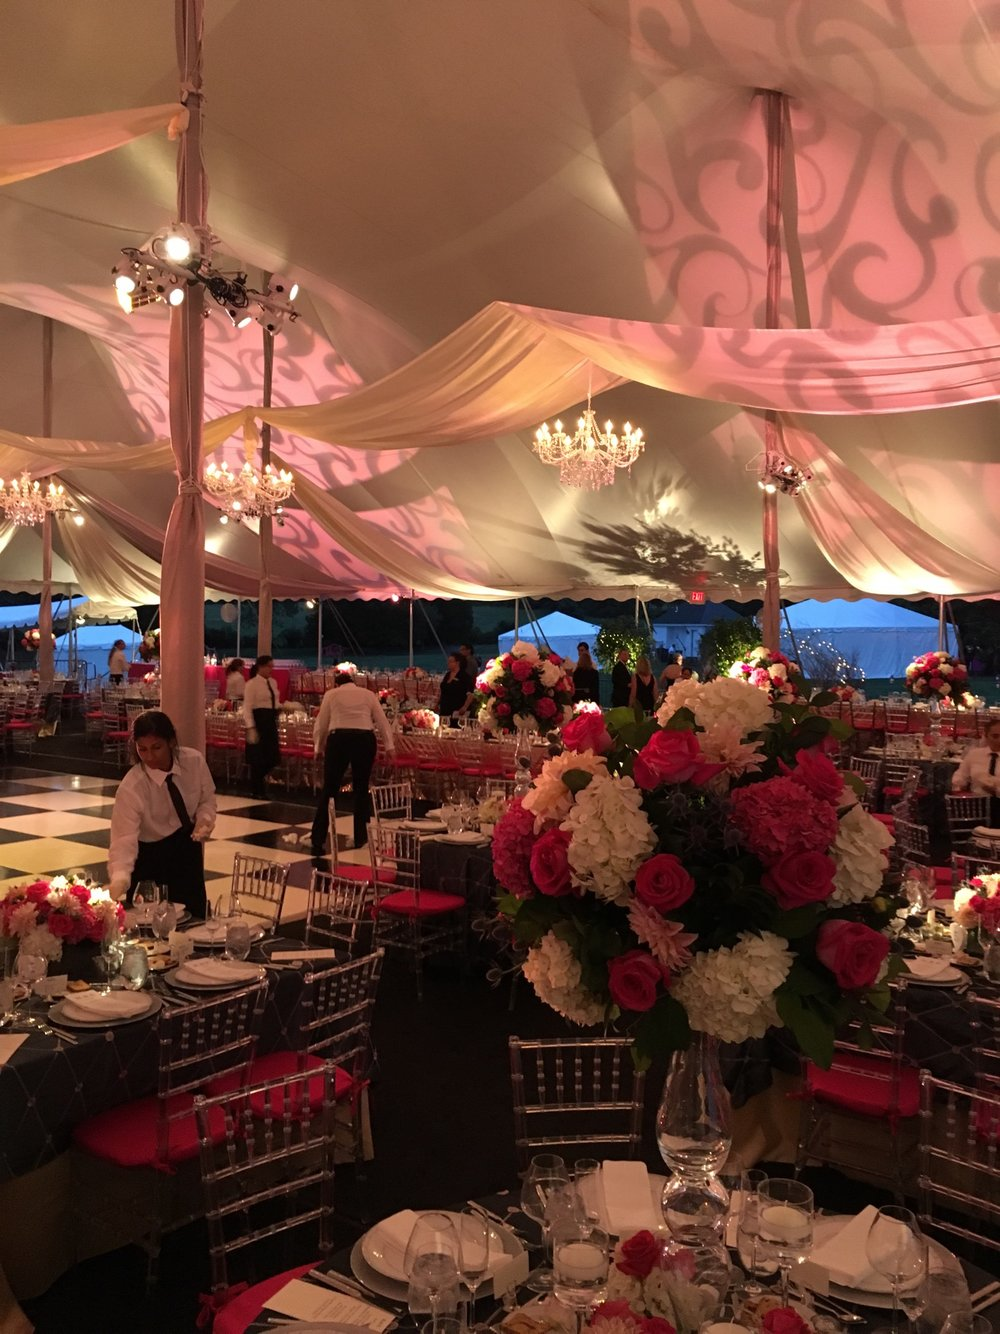 NJ+event+decor+lighting+design+Eggsotic+events+event+rental+rentals+installation+wedding+ceiling+treatments.jpg